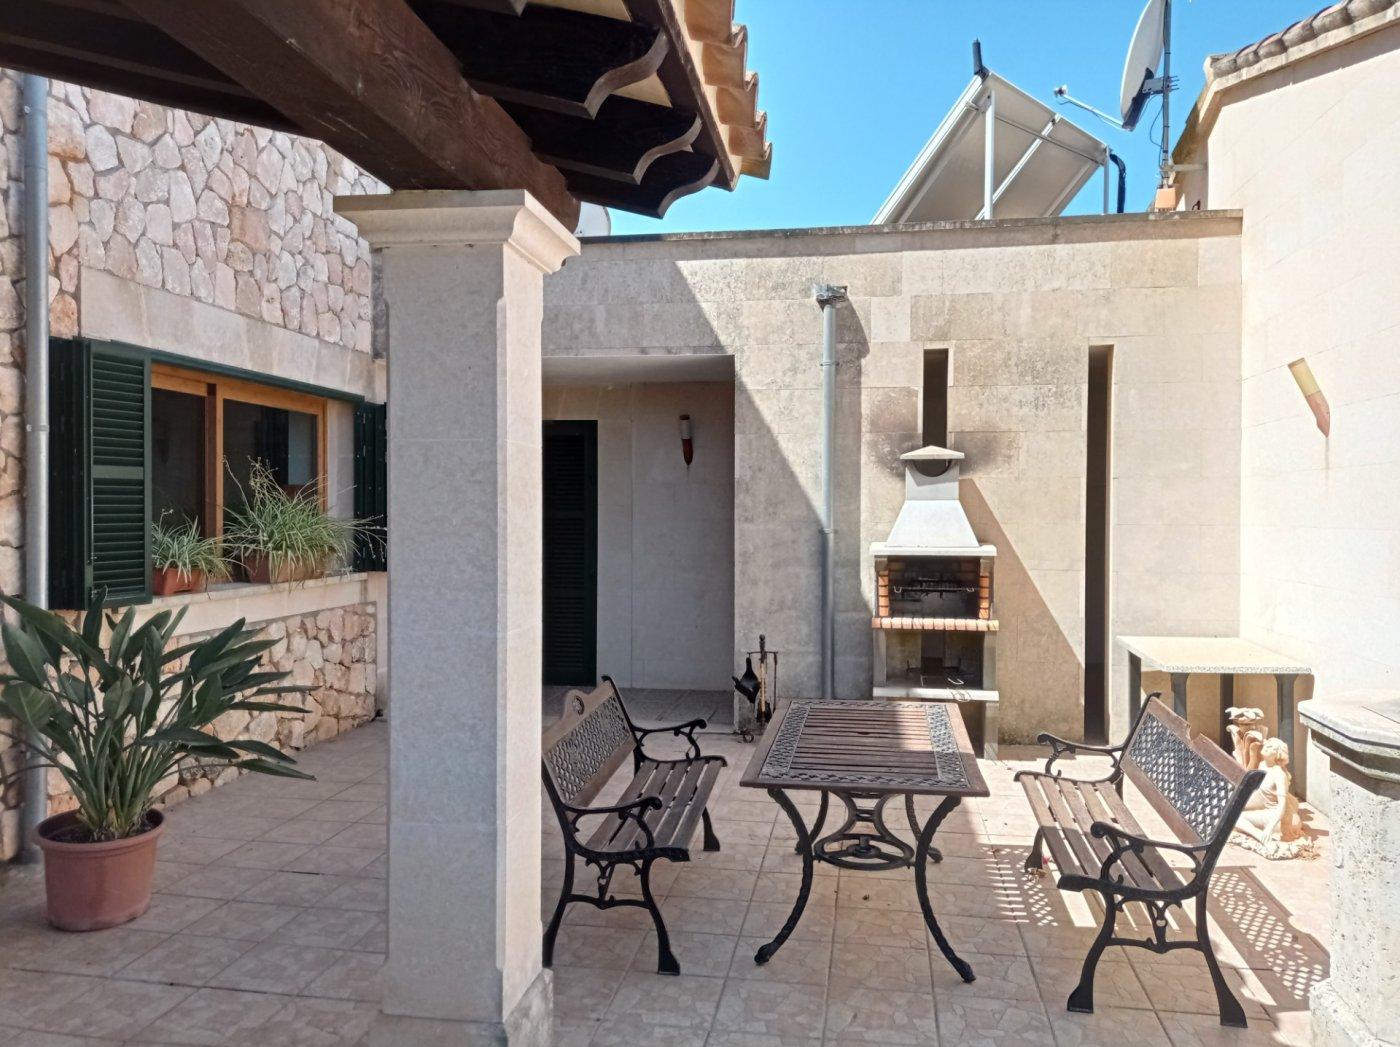 Finca es vinyet hotel boutique for sale in petra - imagenInmueble10